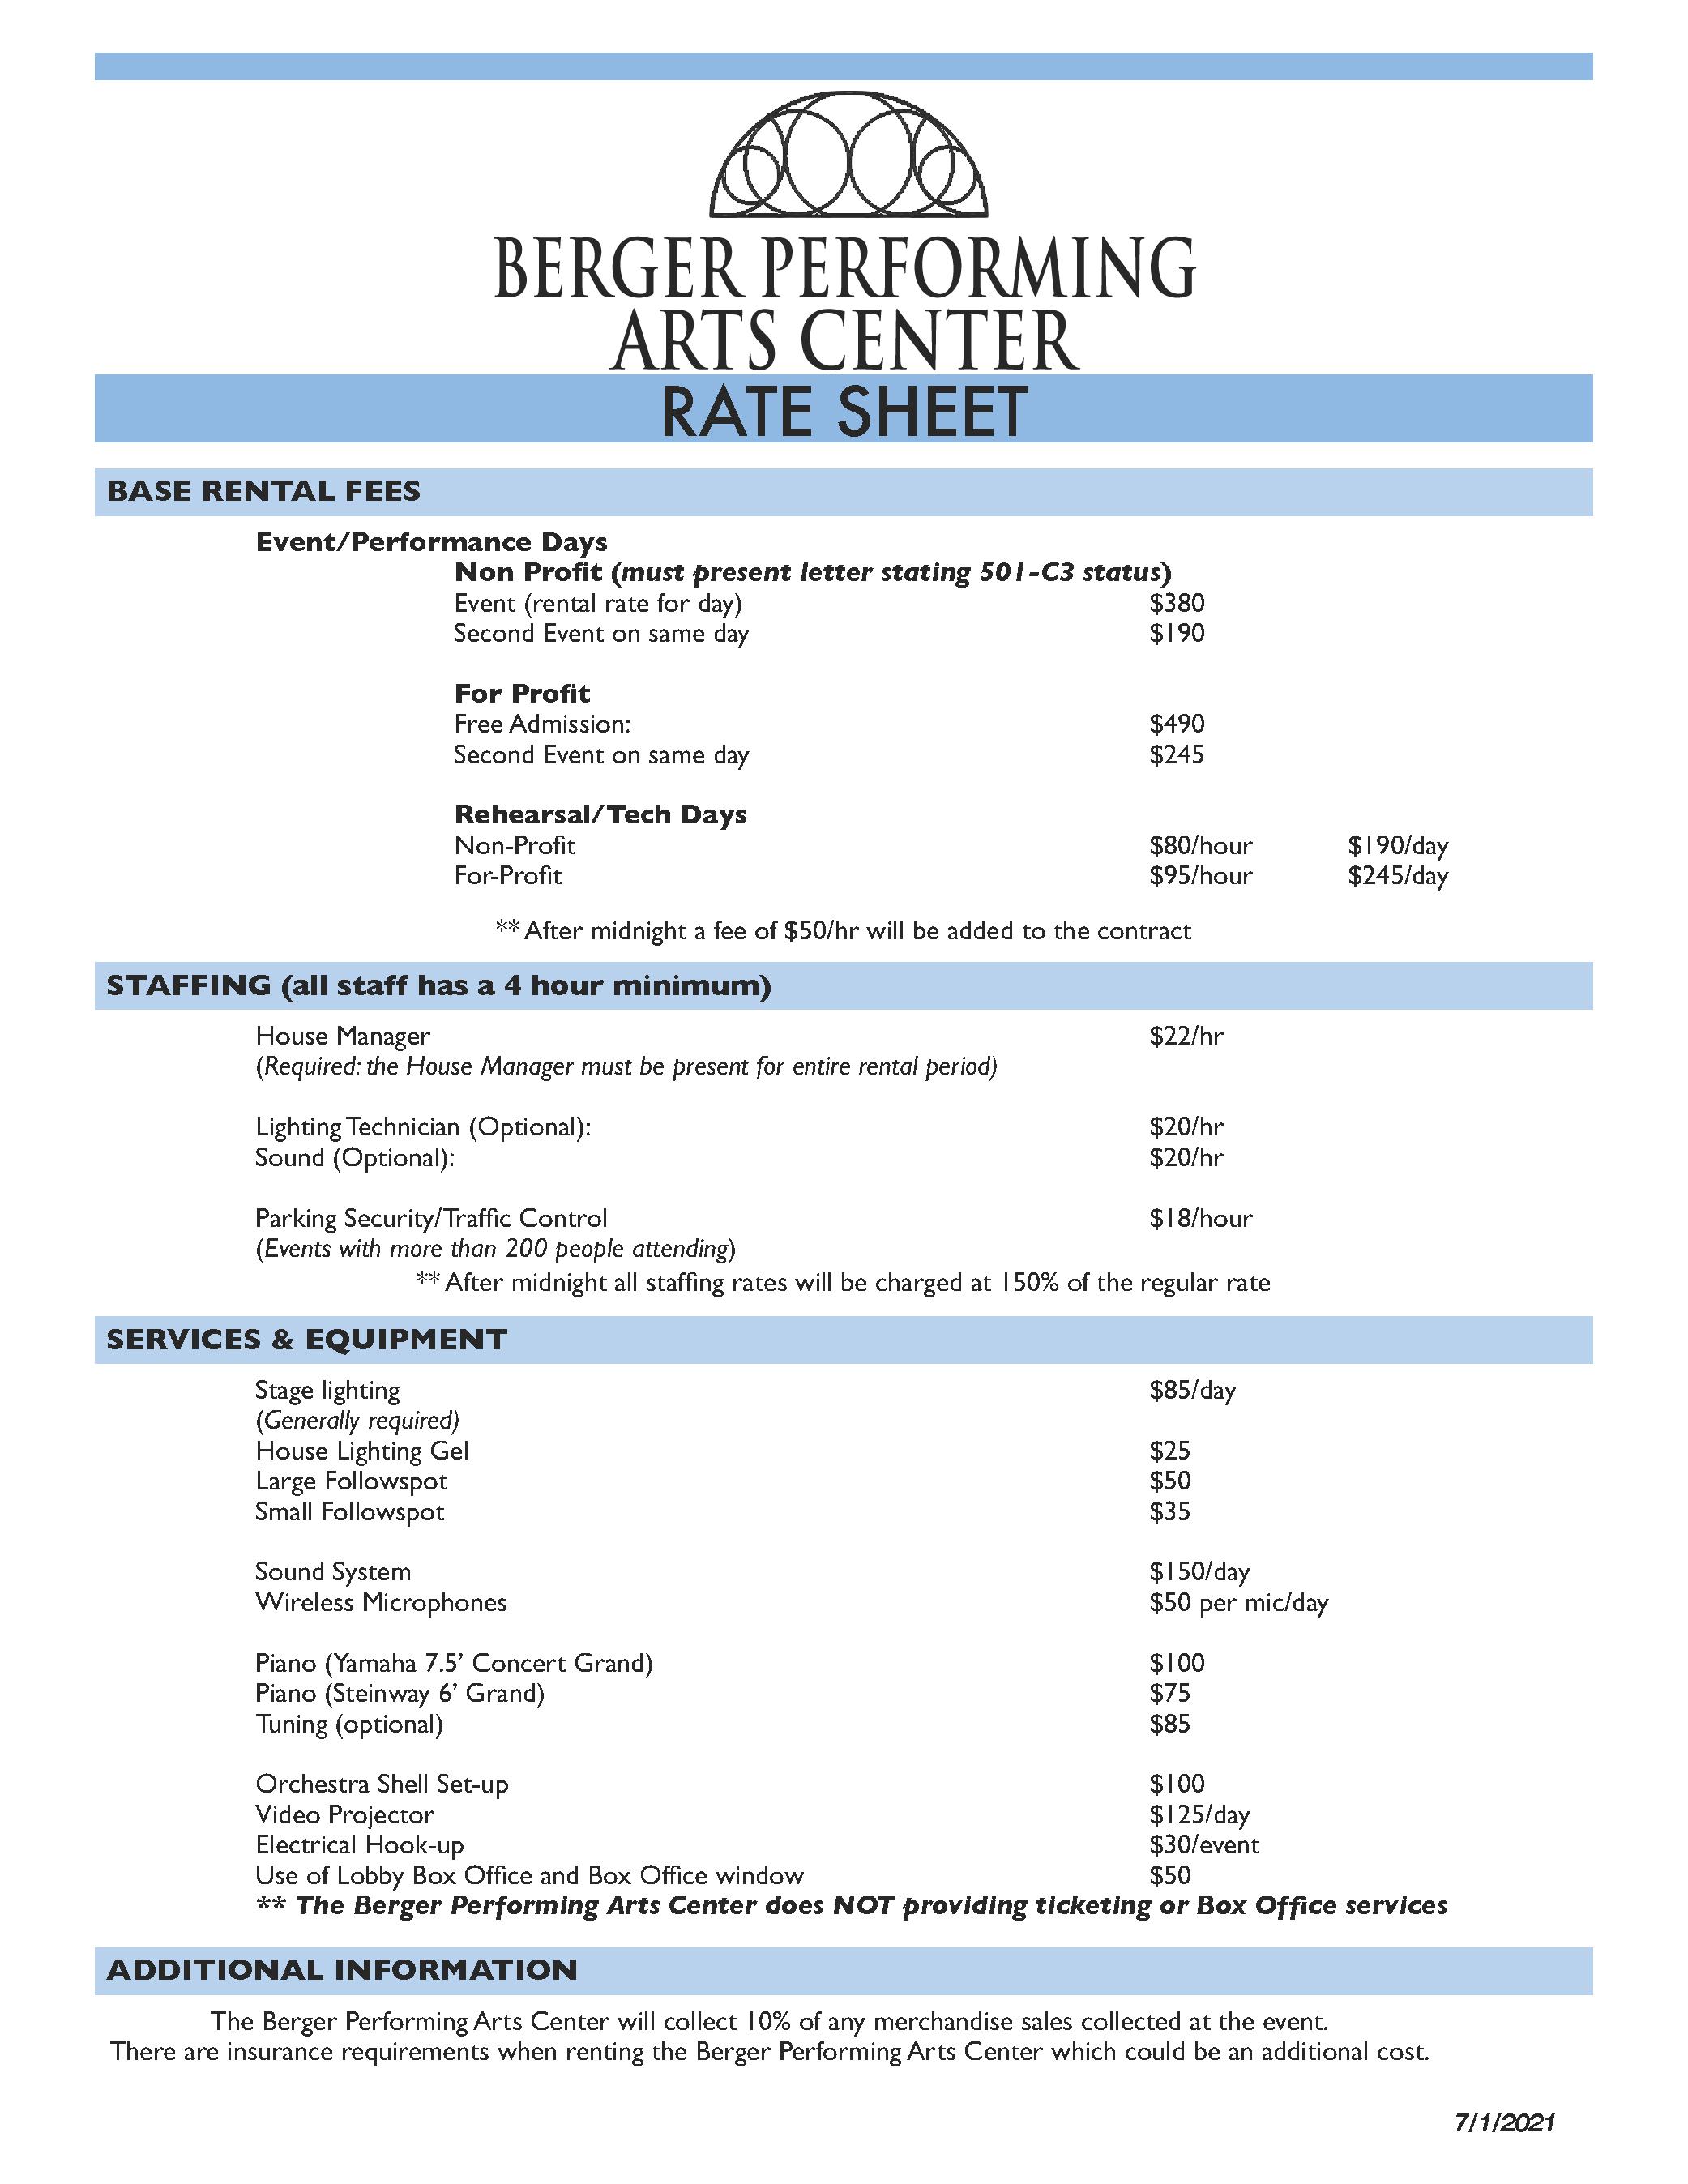 Berger Rate Sheet 21